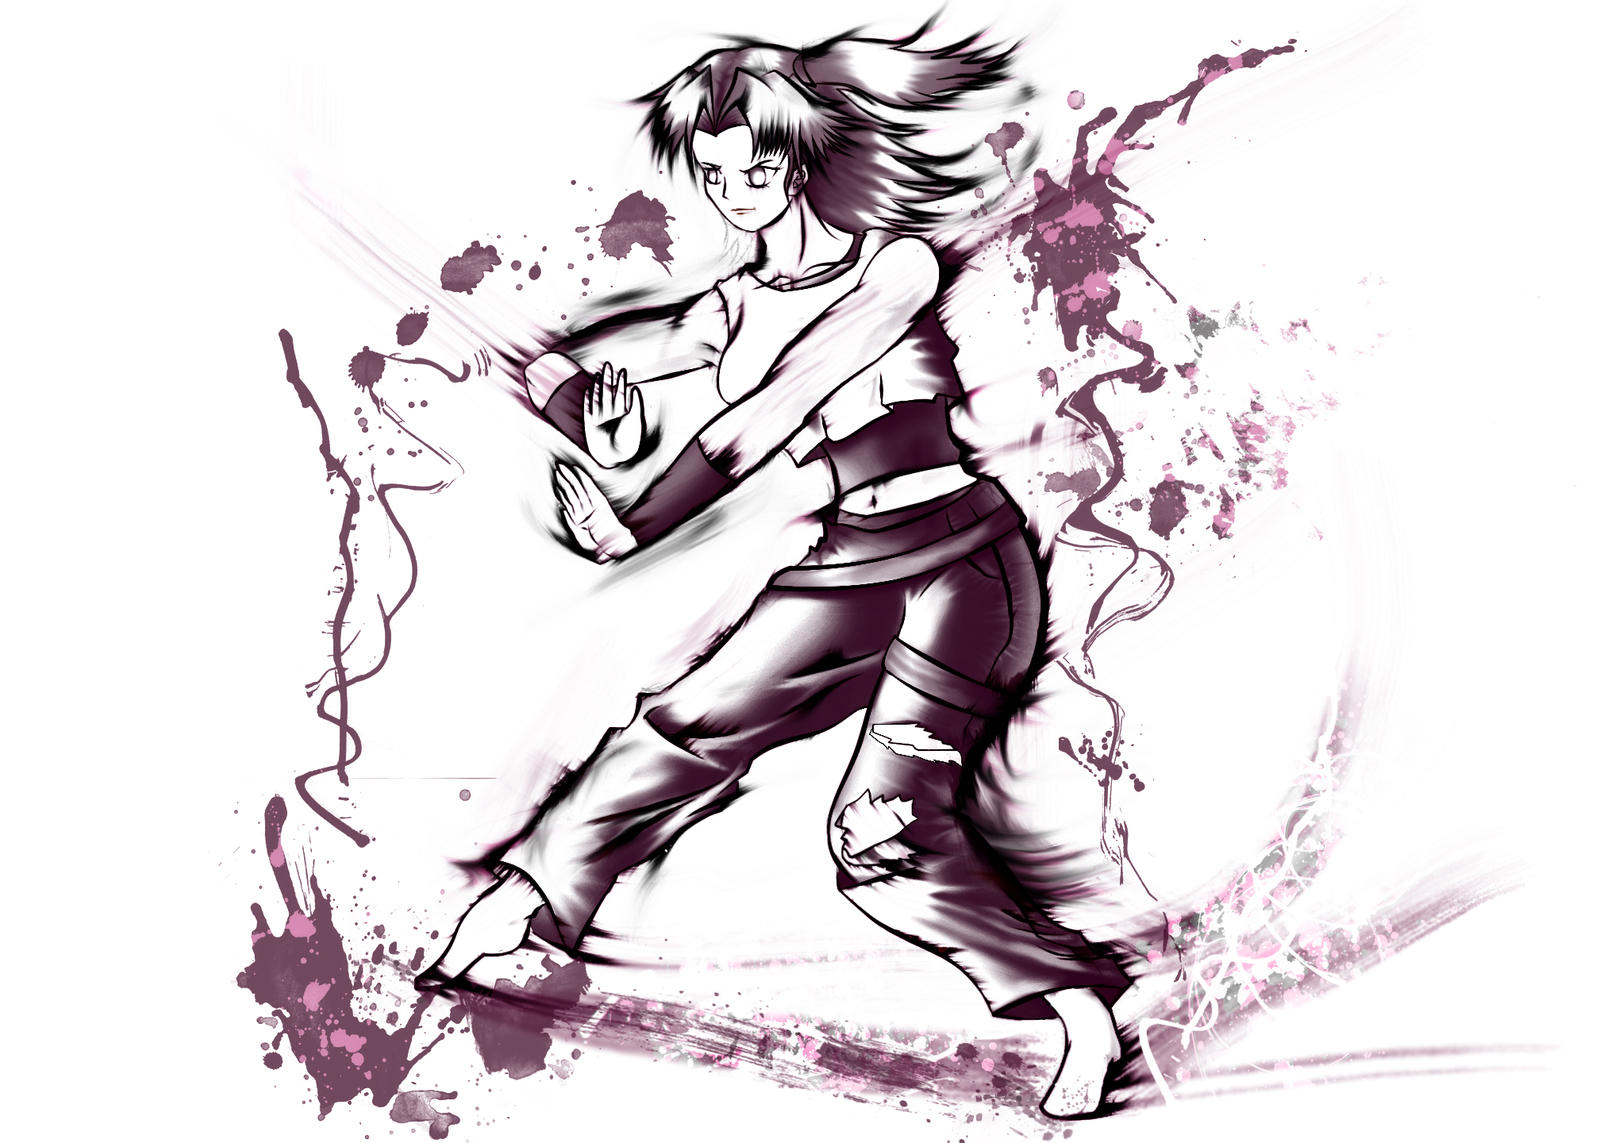 my_fighting_gal_inky_by_swordofdeath